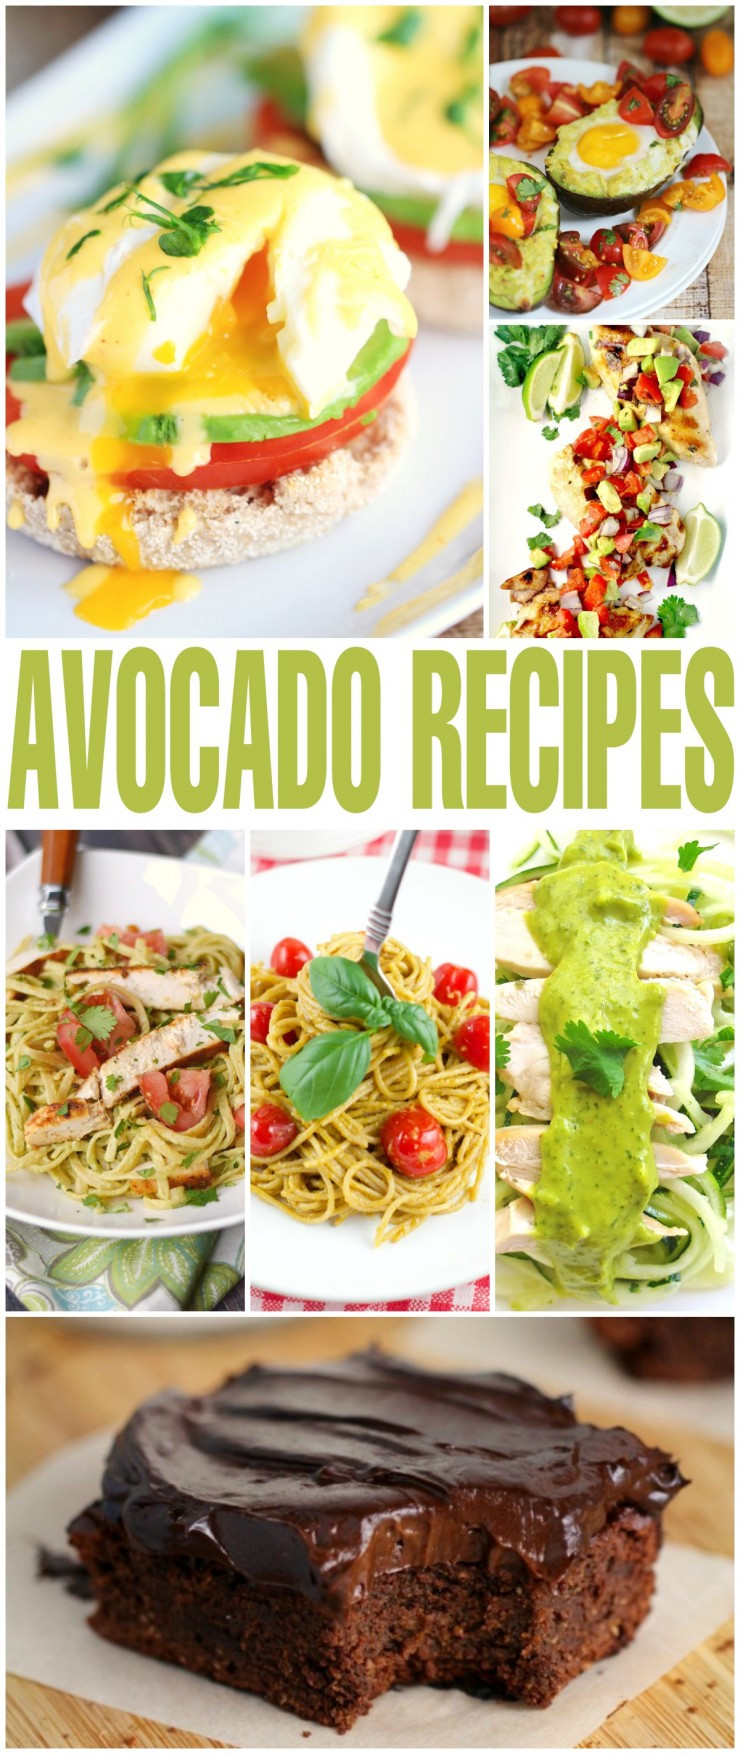 Healthy Avocado Recipes  Healthy Avocado Recipes Frugal Mom Eh